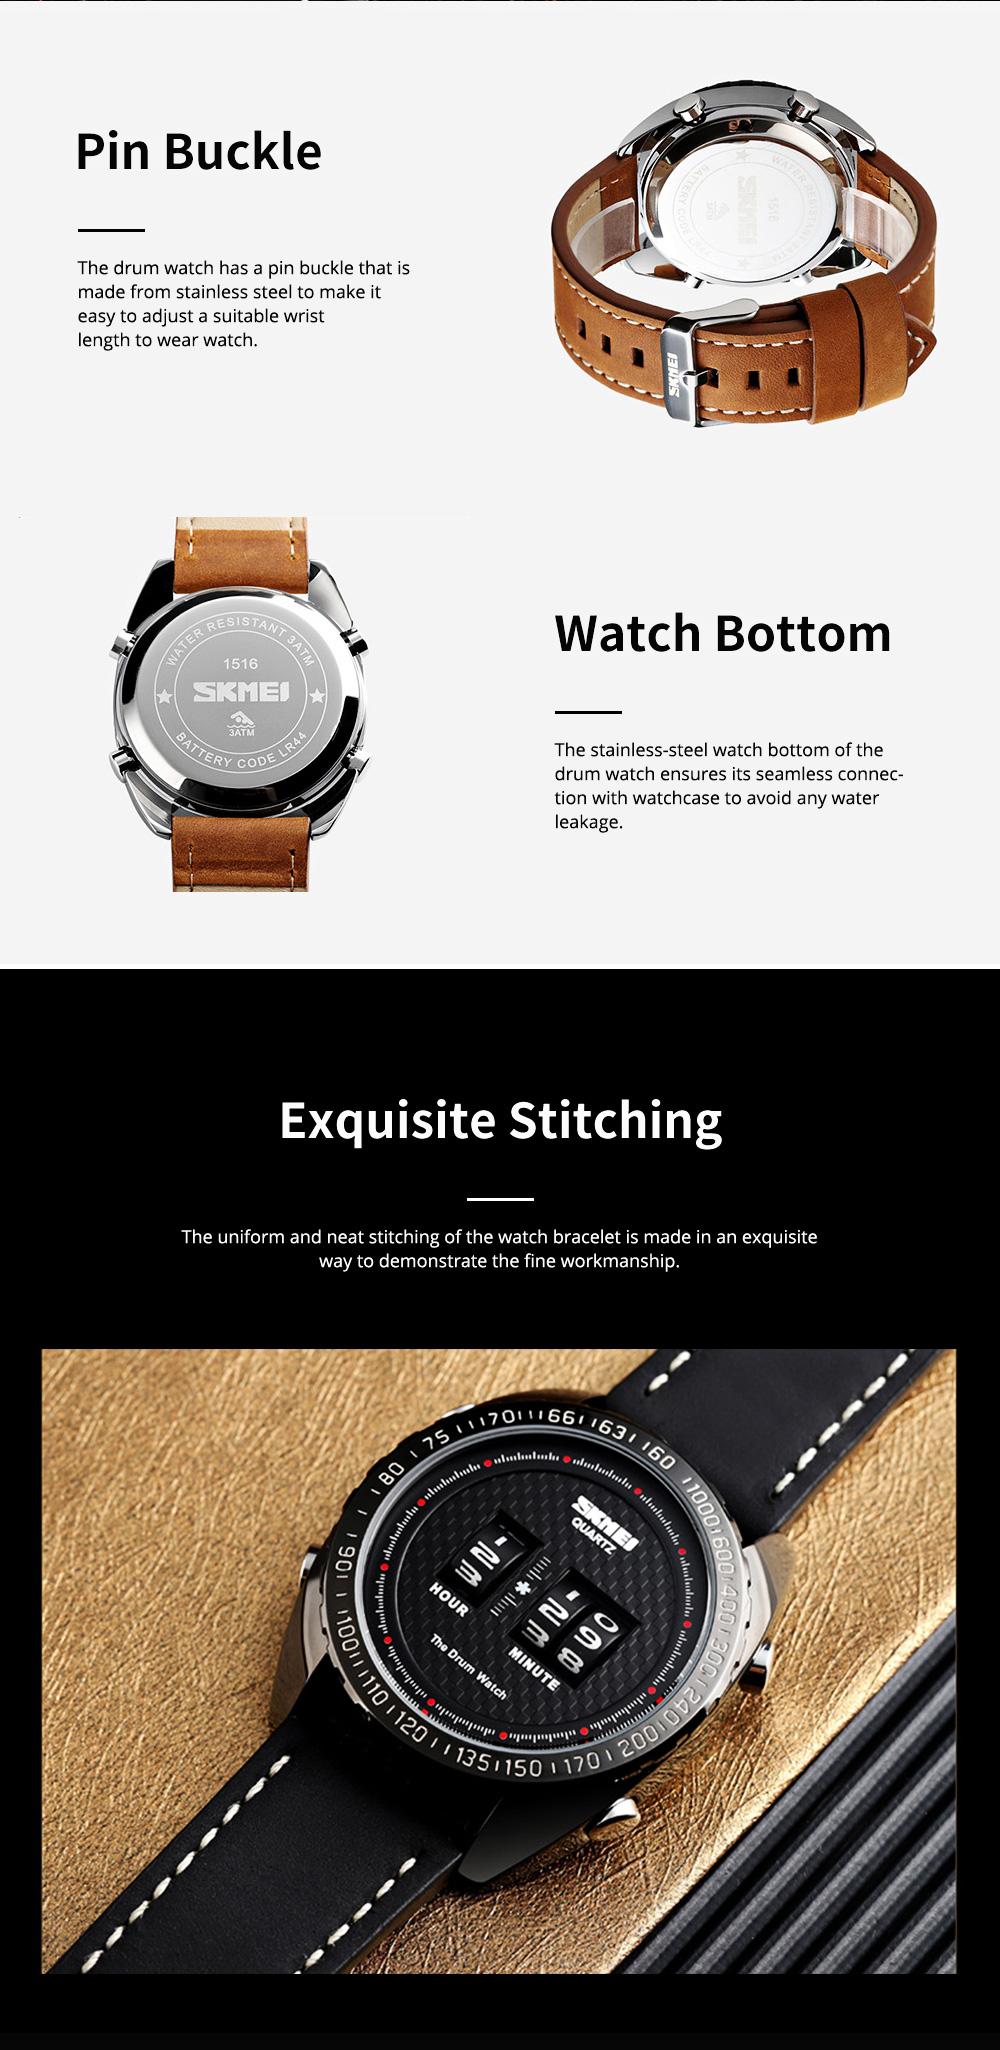 Fashionable Casual Men's Drum Watch with Genuine Leather Bracelet Waterproof Qualified Quartz Movement Wristwatch Round Dial Roller Wrist Watch 6